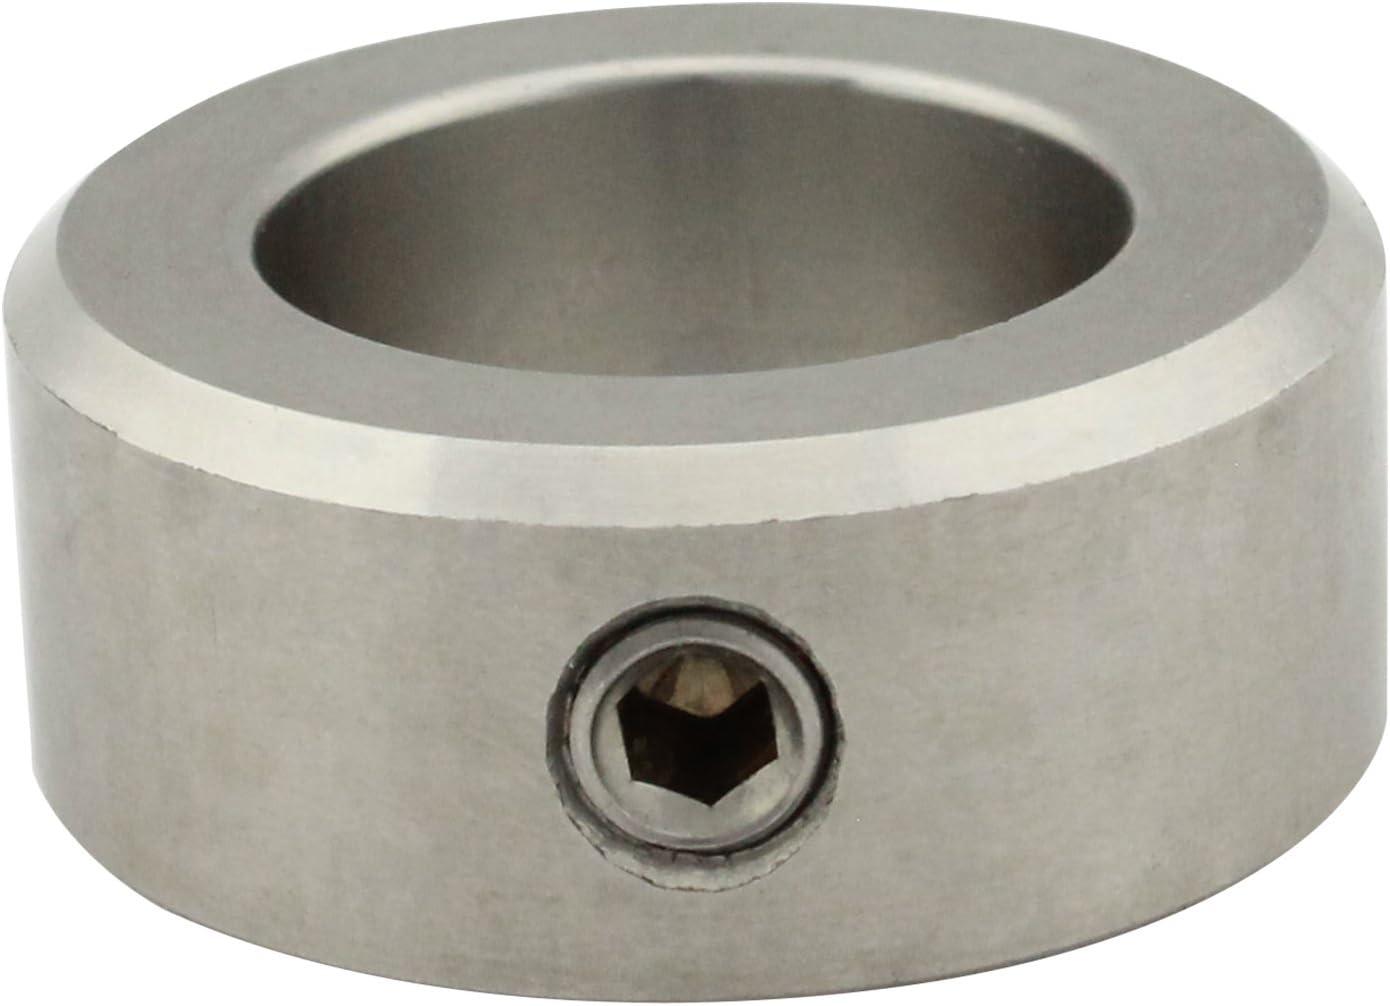 V2A Stellring 1, Innen-/Ø = 26 mm Kiefer24 Edelstahl A2 Stellringe DIN 705 A2 mit Gewindestift DIN 914